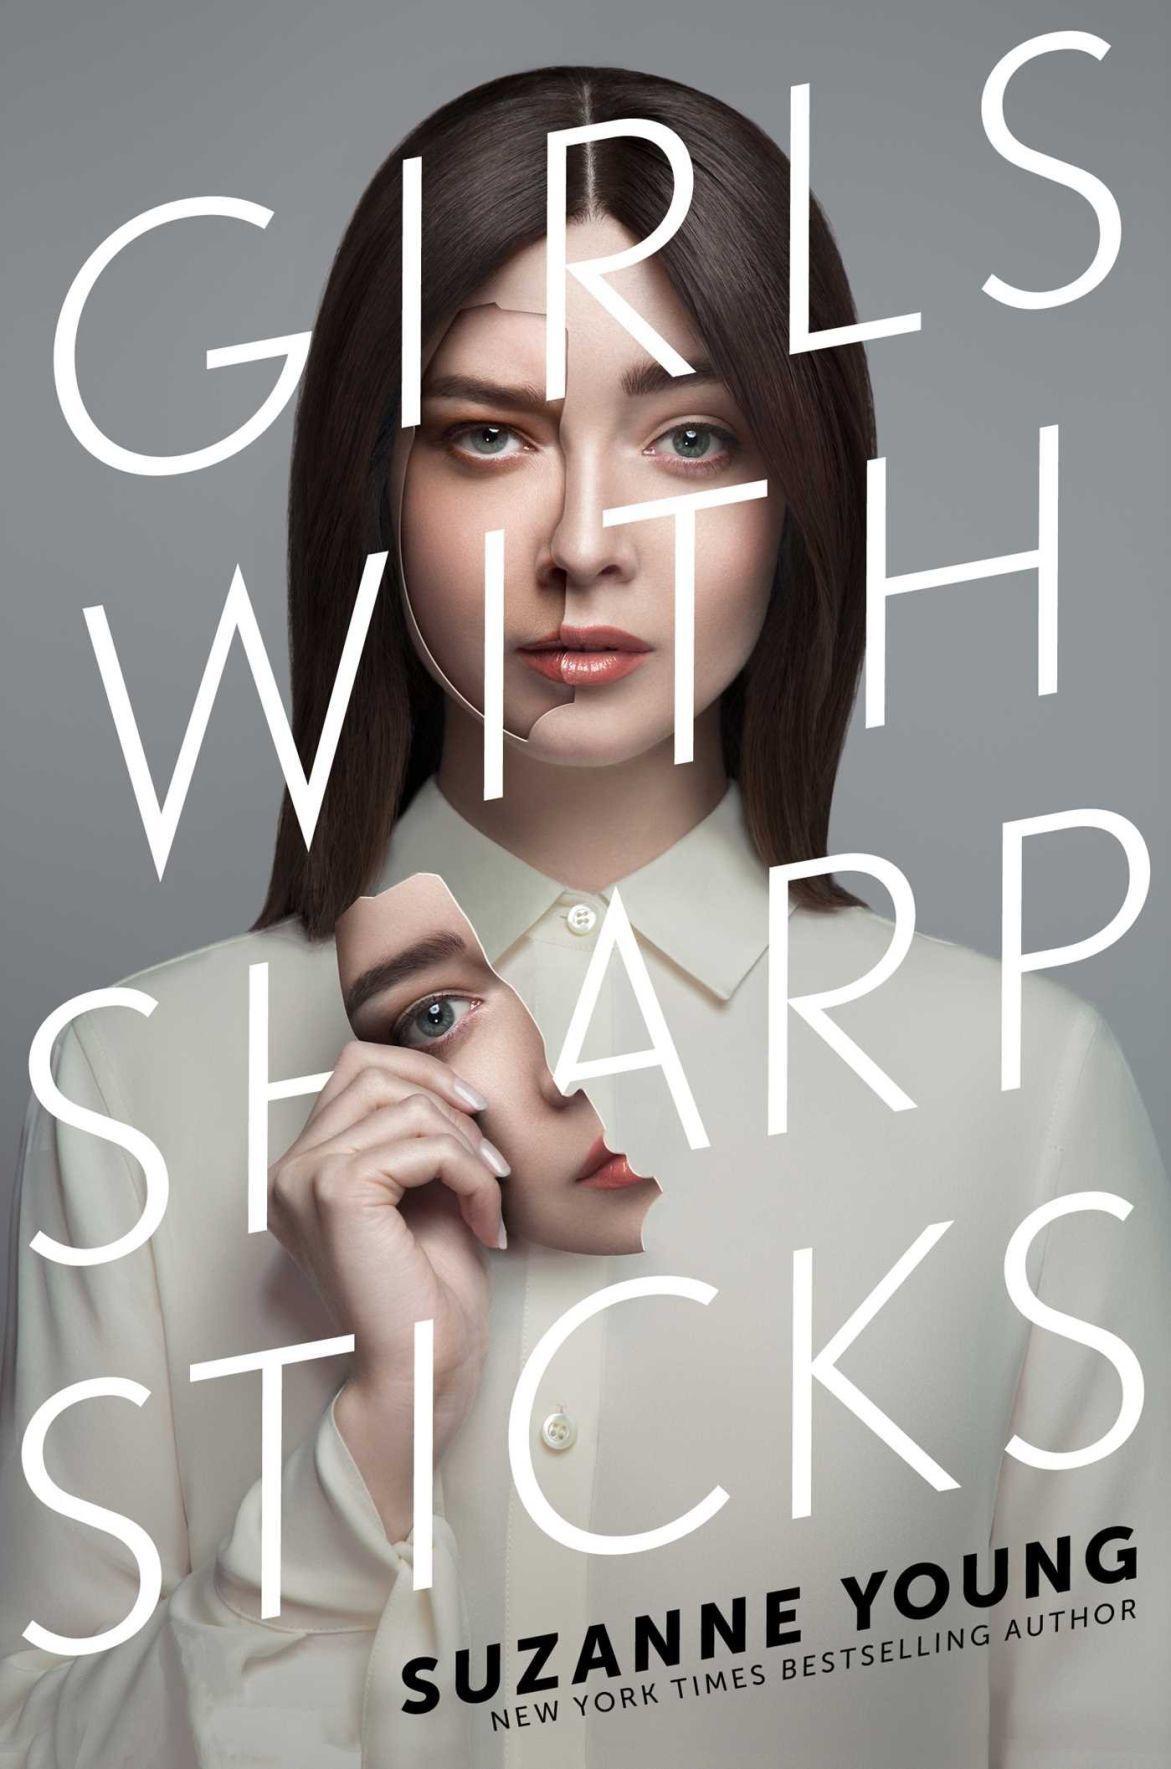 GirlsWithSharpSticks.jpg